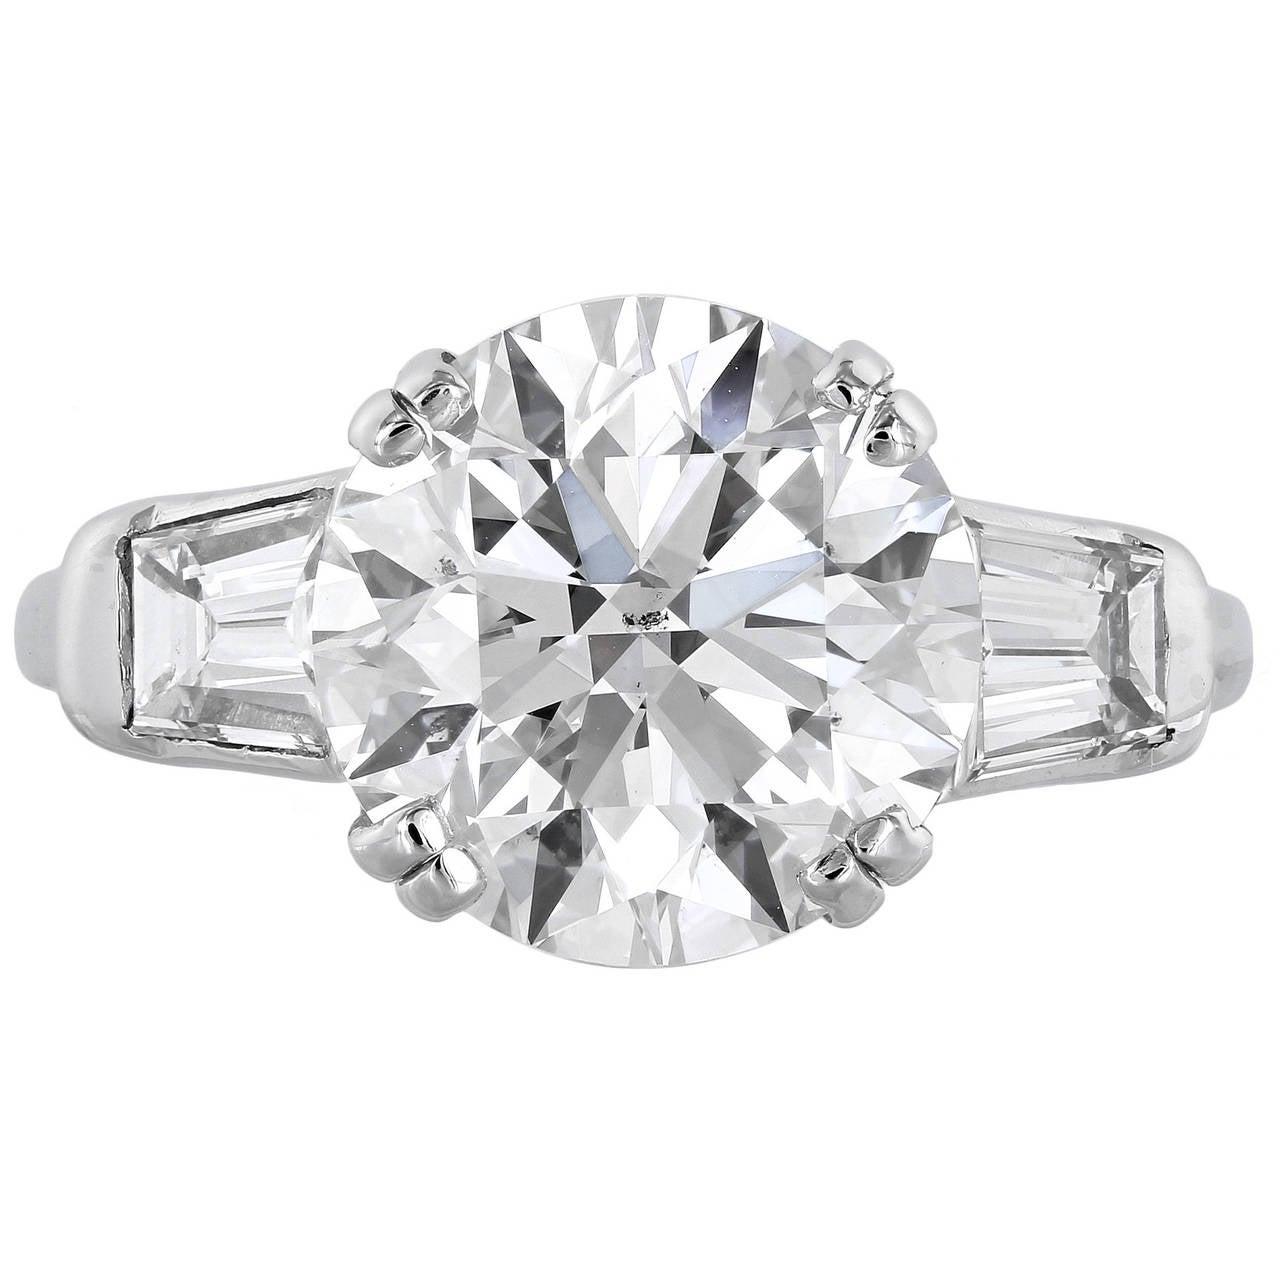 GIA Certified 5.02 I SI1 Brilliant Cut Three-Stone Diamond Engagement Plat Ring